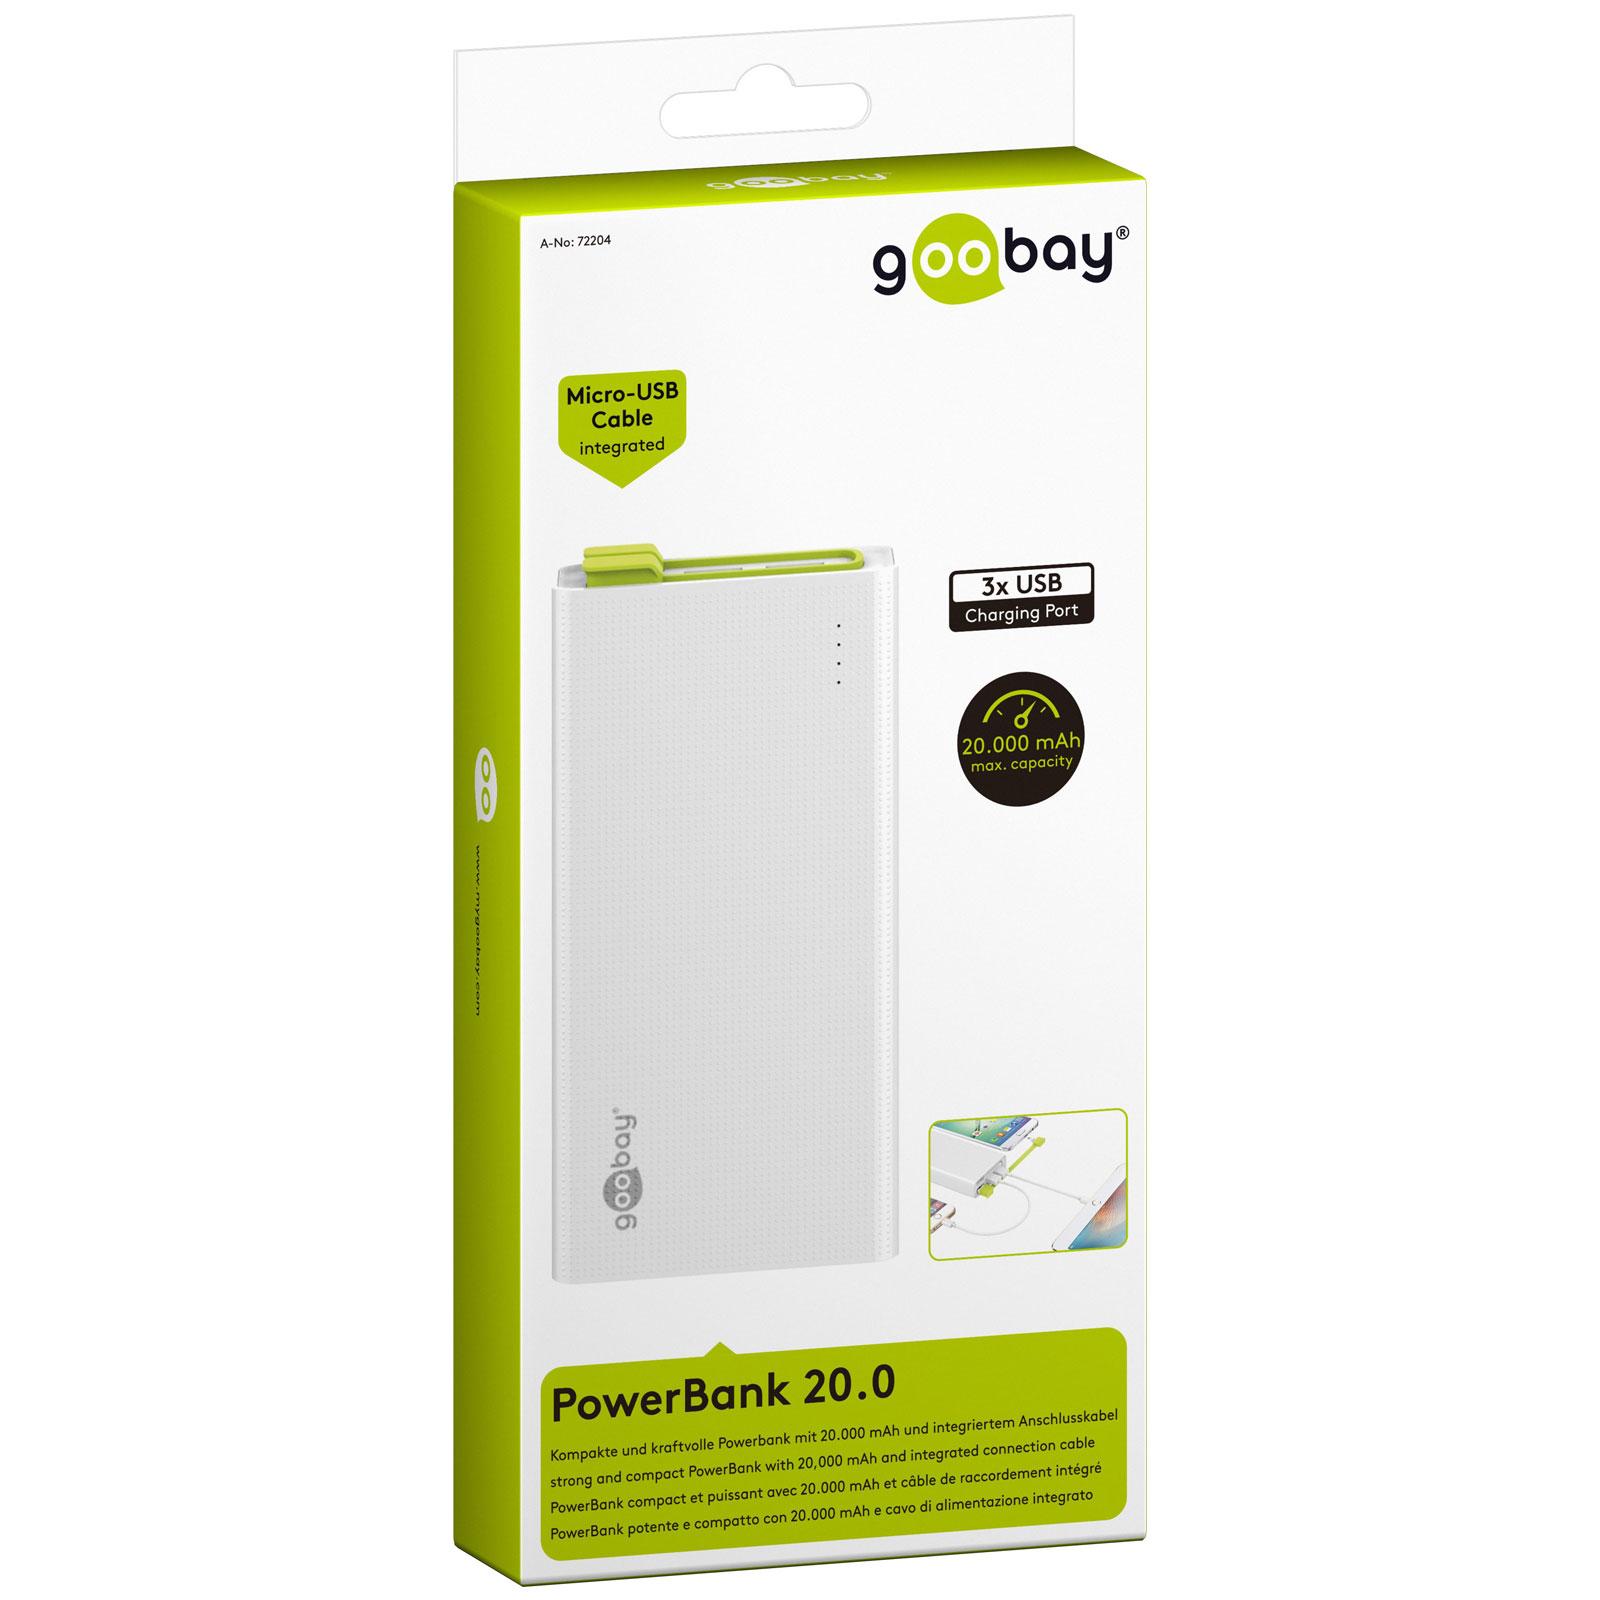 goobay powerbank 20 0 batterie t l phone goobay sur. Black Bedroom Furniture Sets. Home Design Ideas